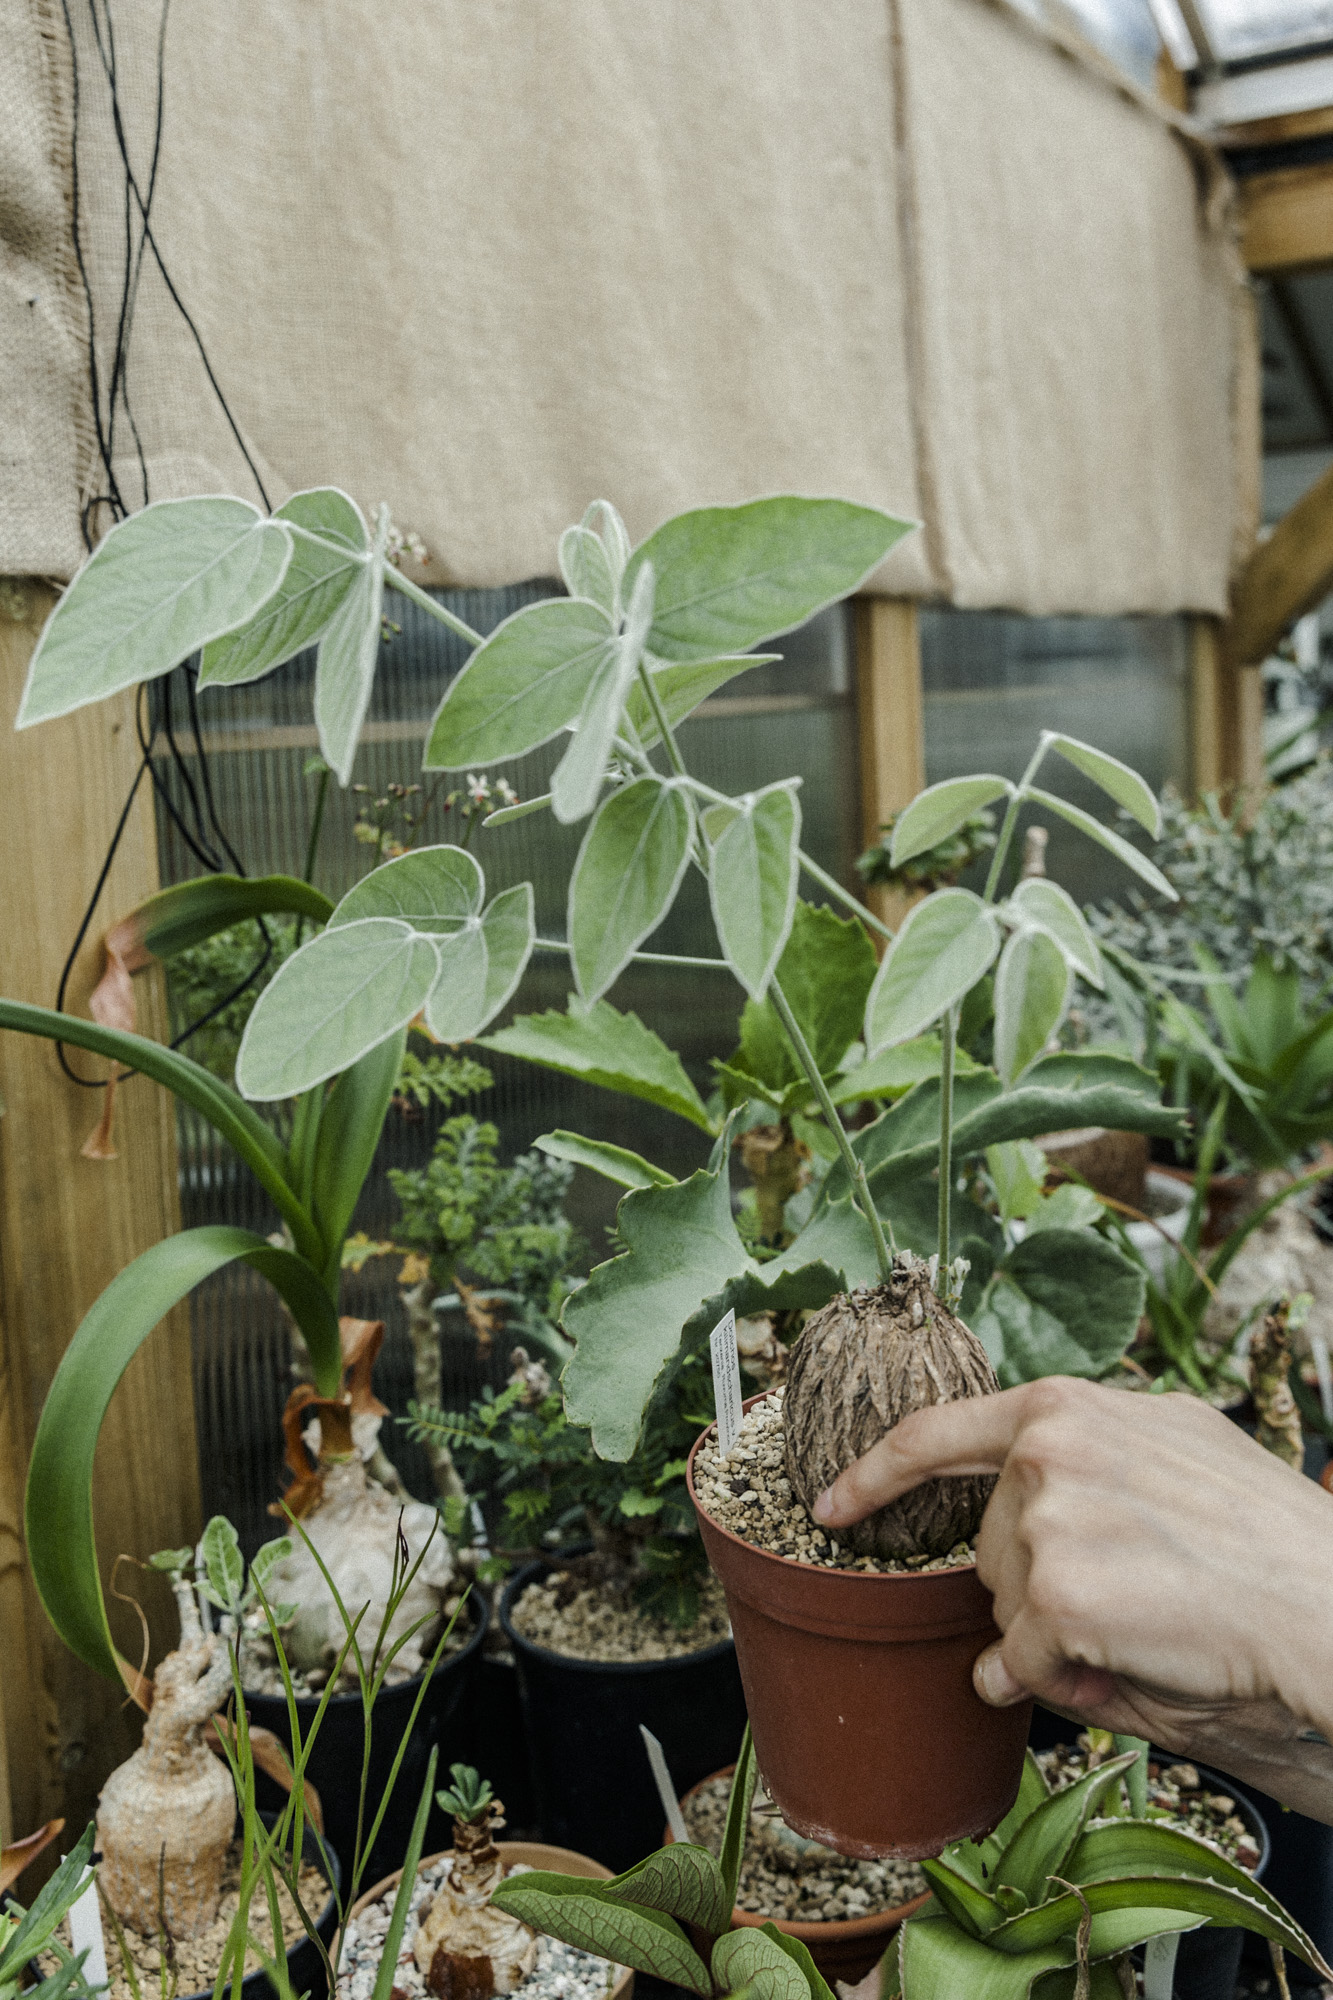 plantemagasinet gro solheim gartneri